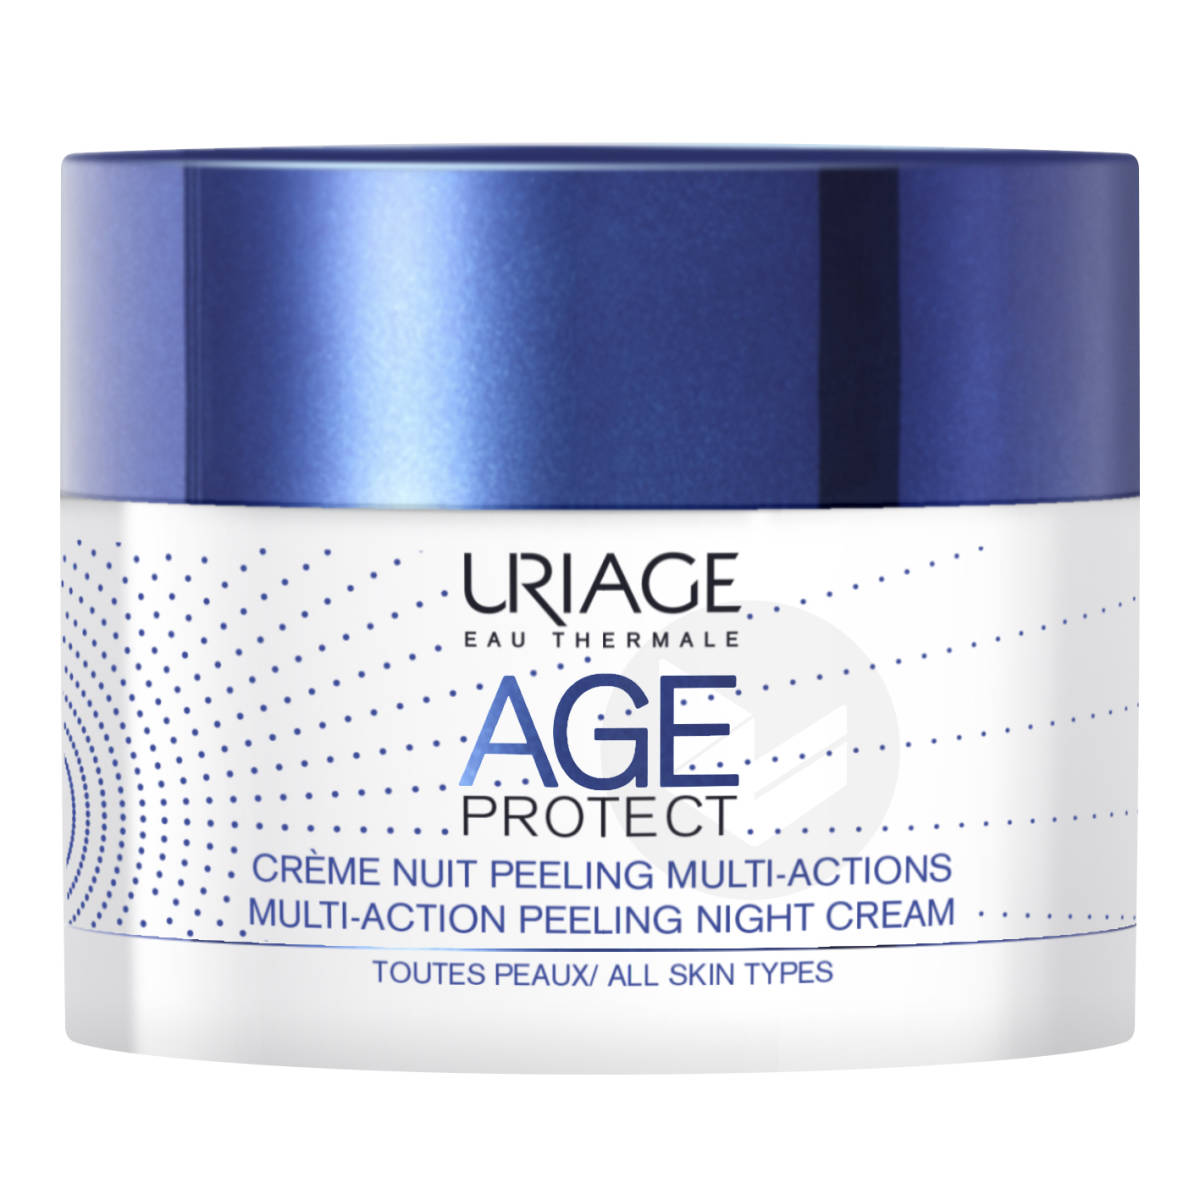 AGE PROTECT Crème nuit peeling multi-actions 50ml